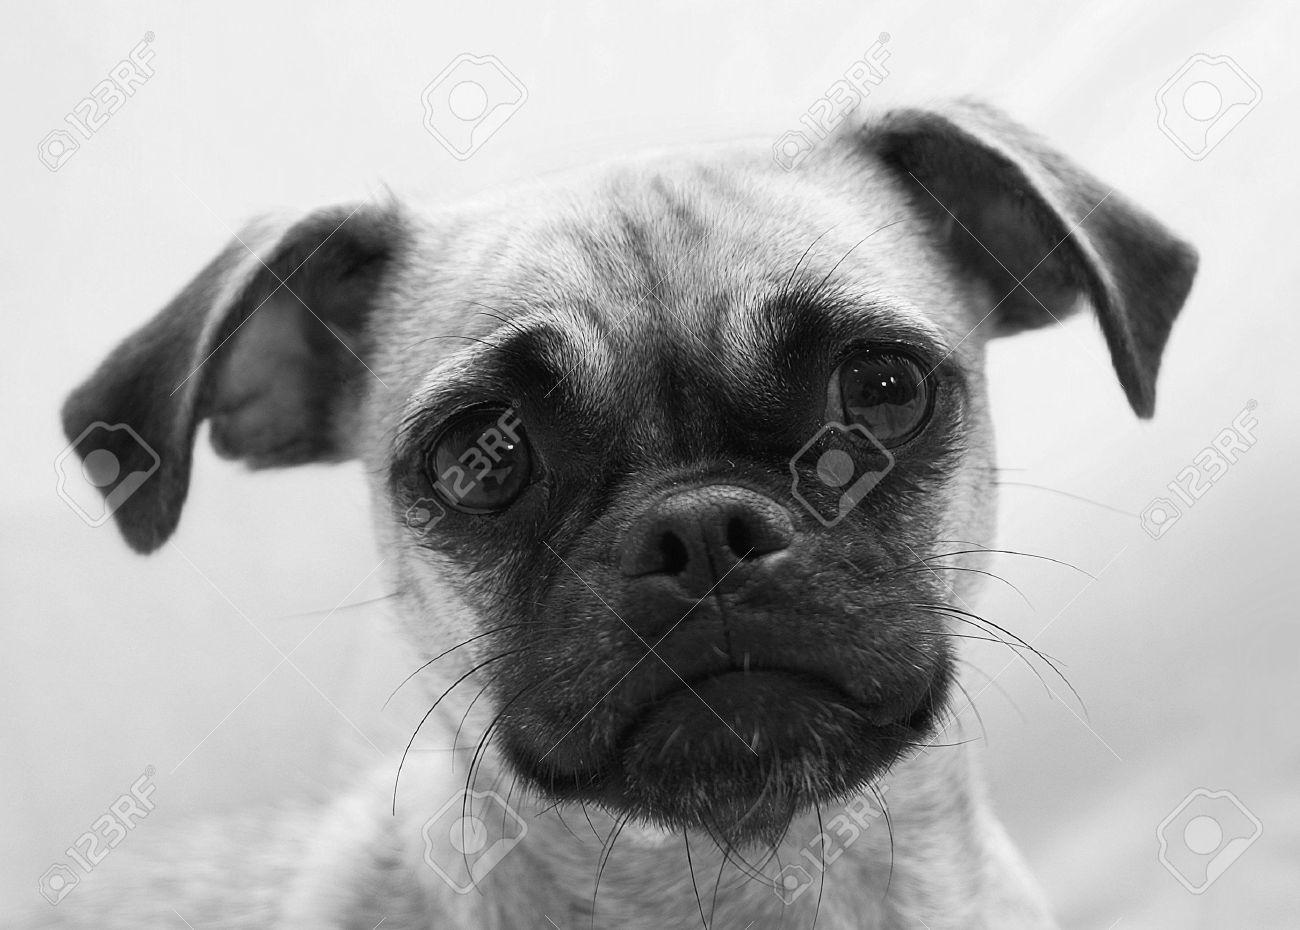 Adorable Chihuahua Pug Mix Puppies